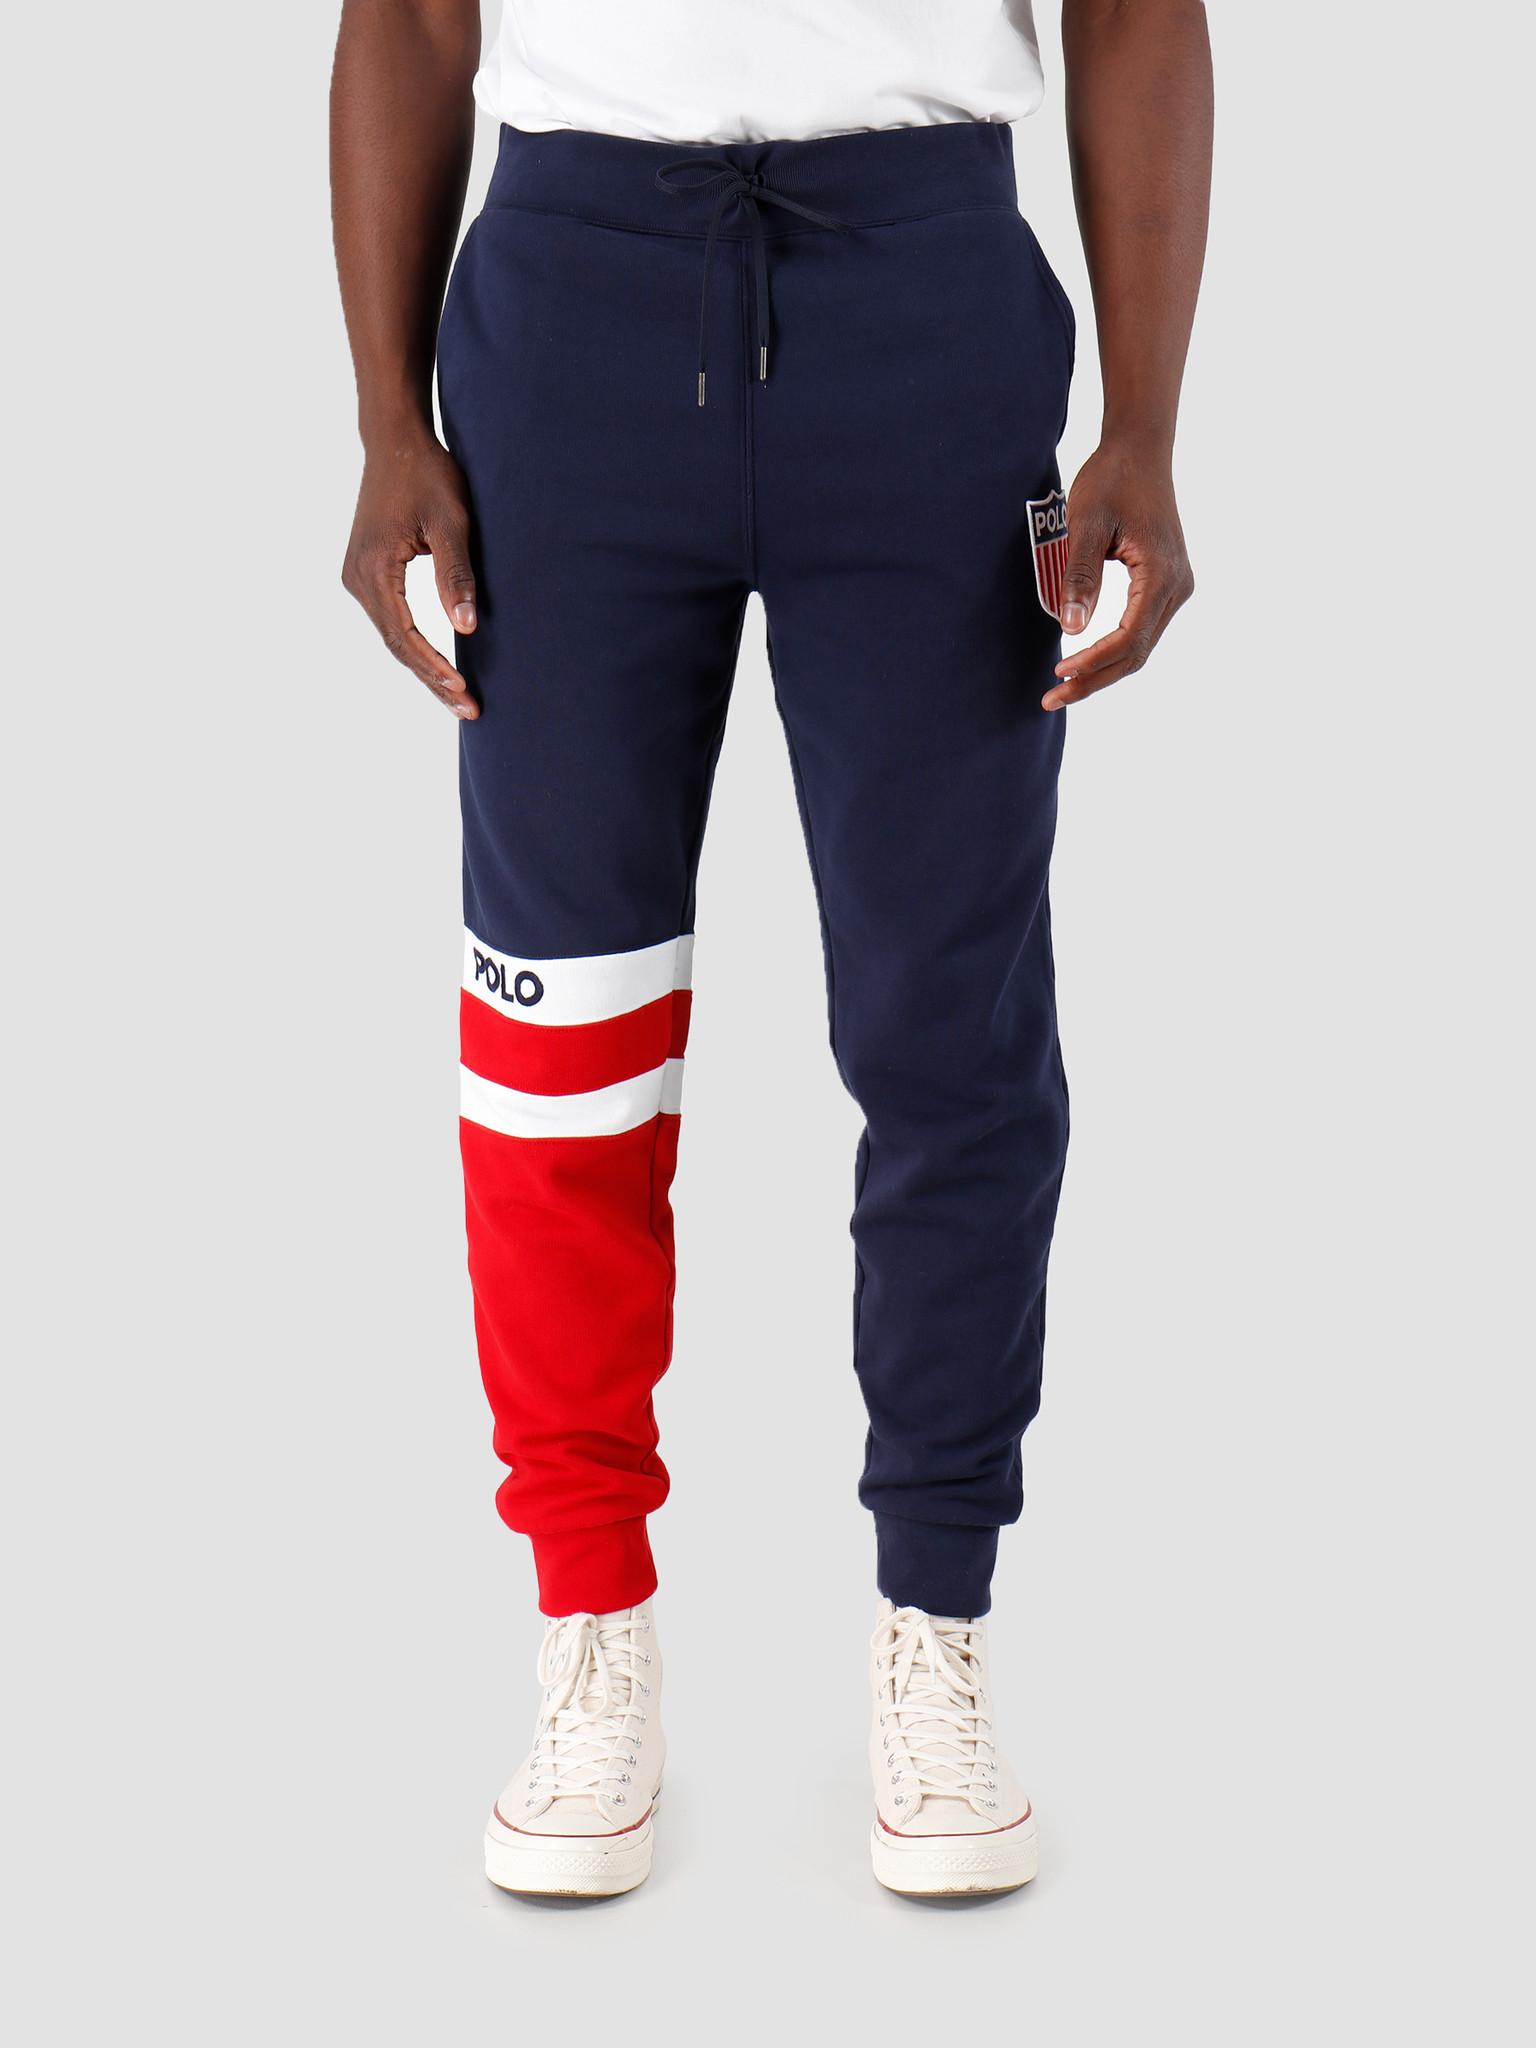 Polo Ralph Lauren Polo Ralph Lauren Popantm5 Athletic Pant Grey 710781170001